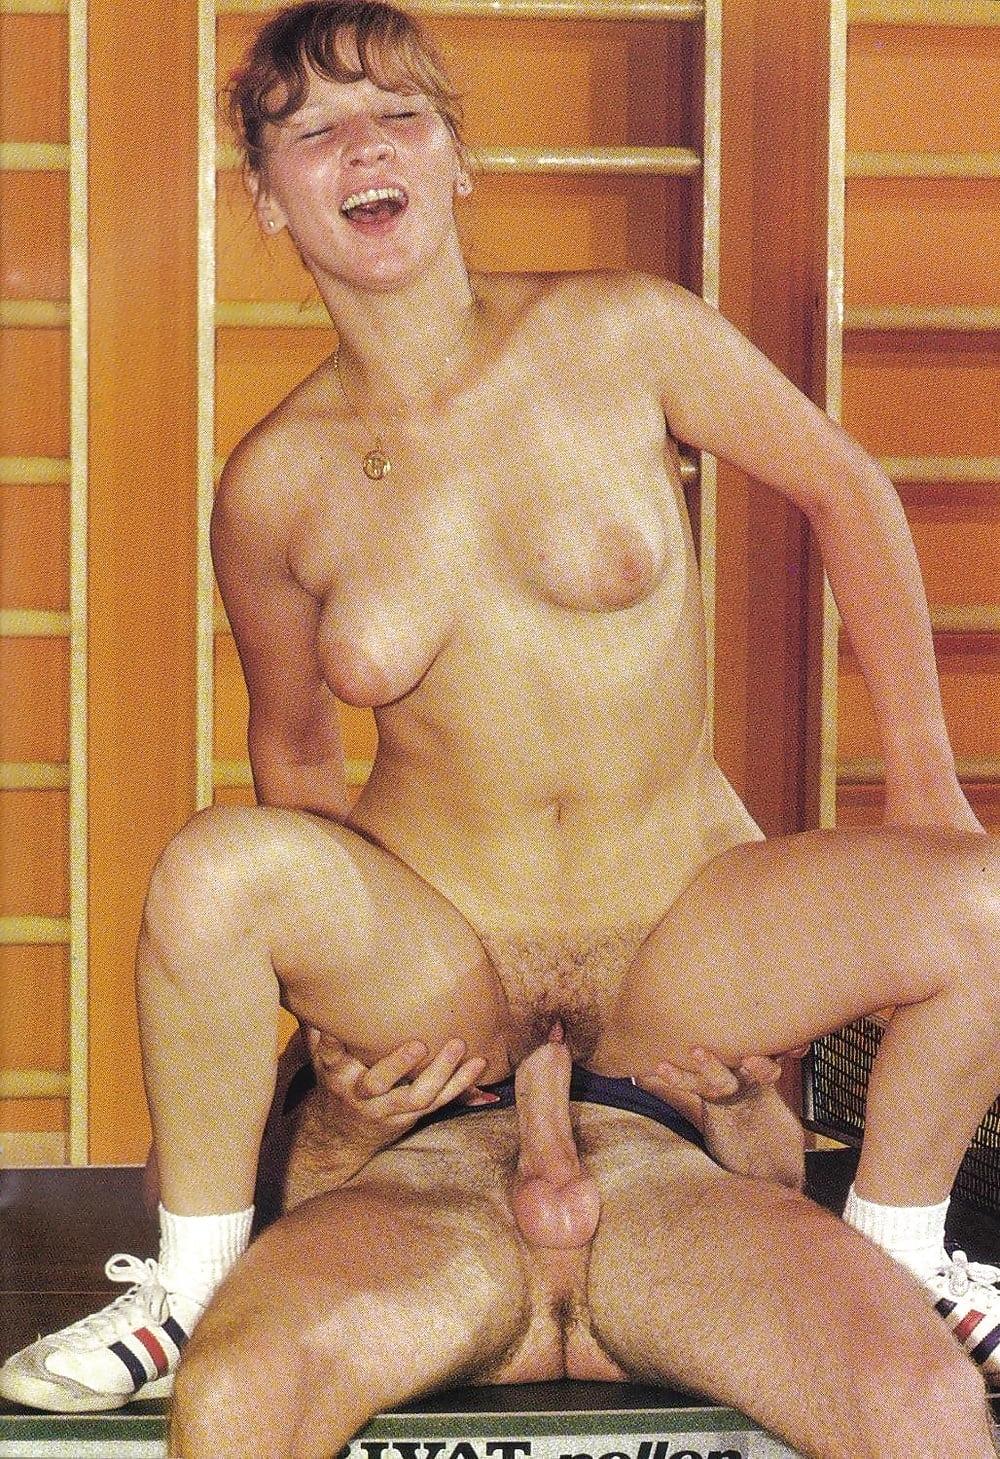 Спортзал ретро порно — pic 15